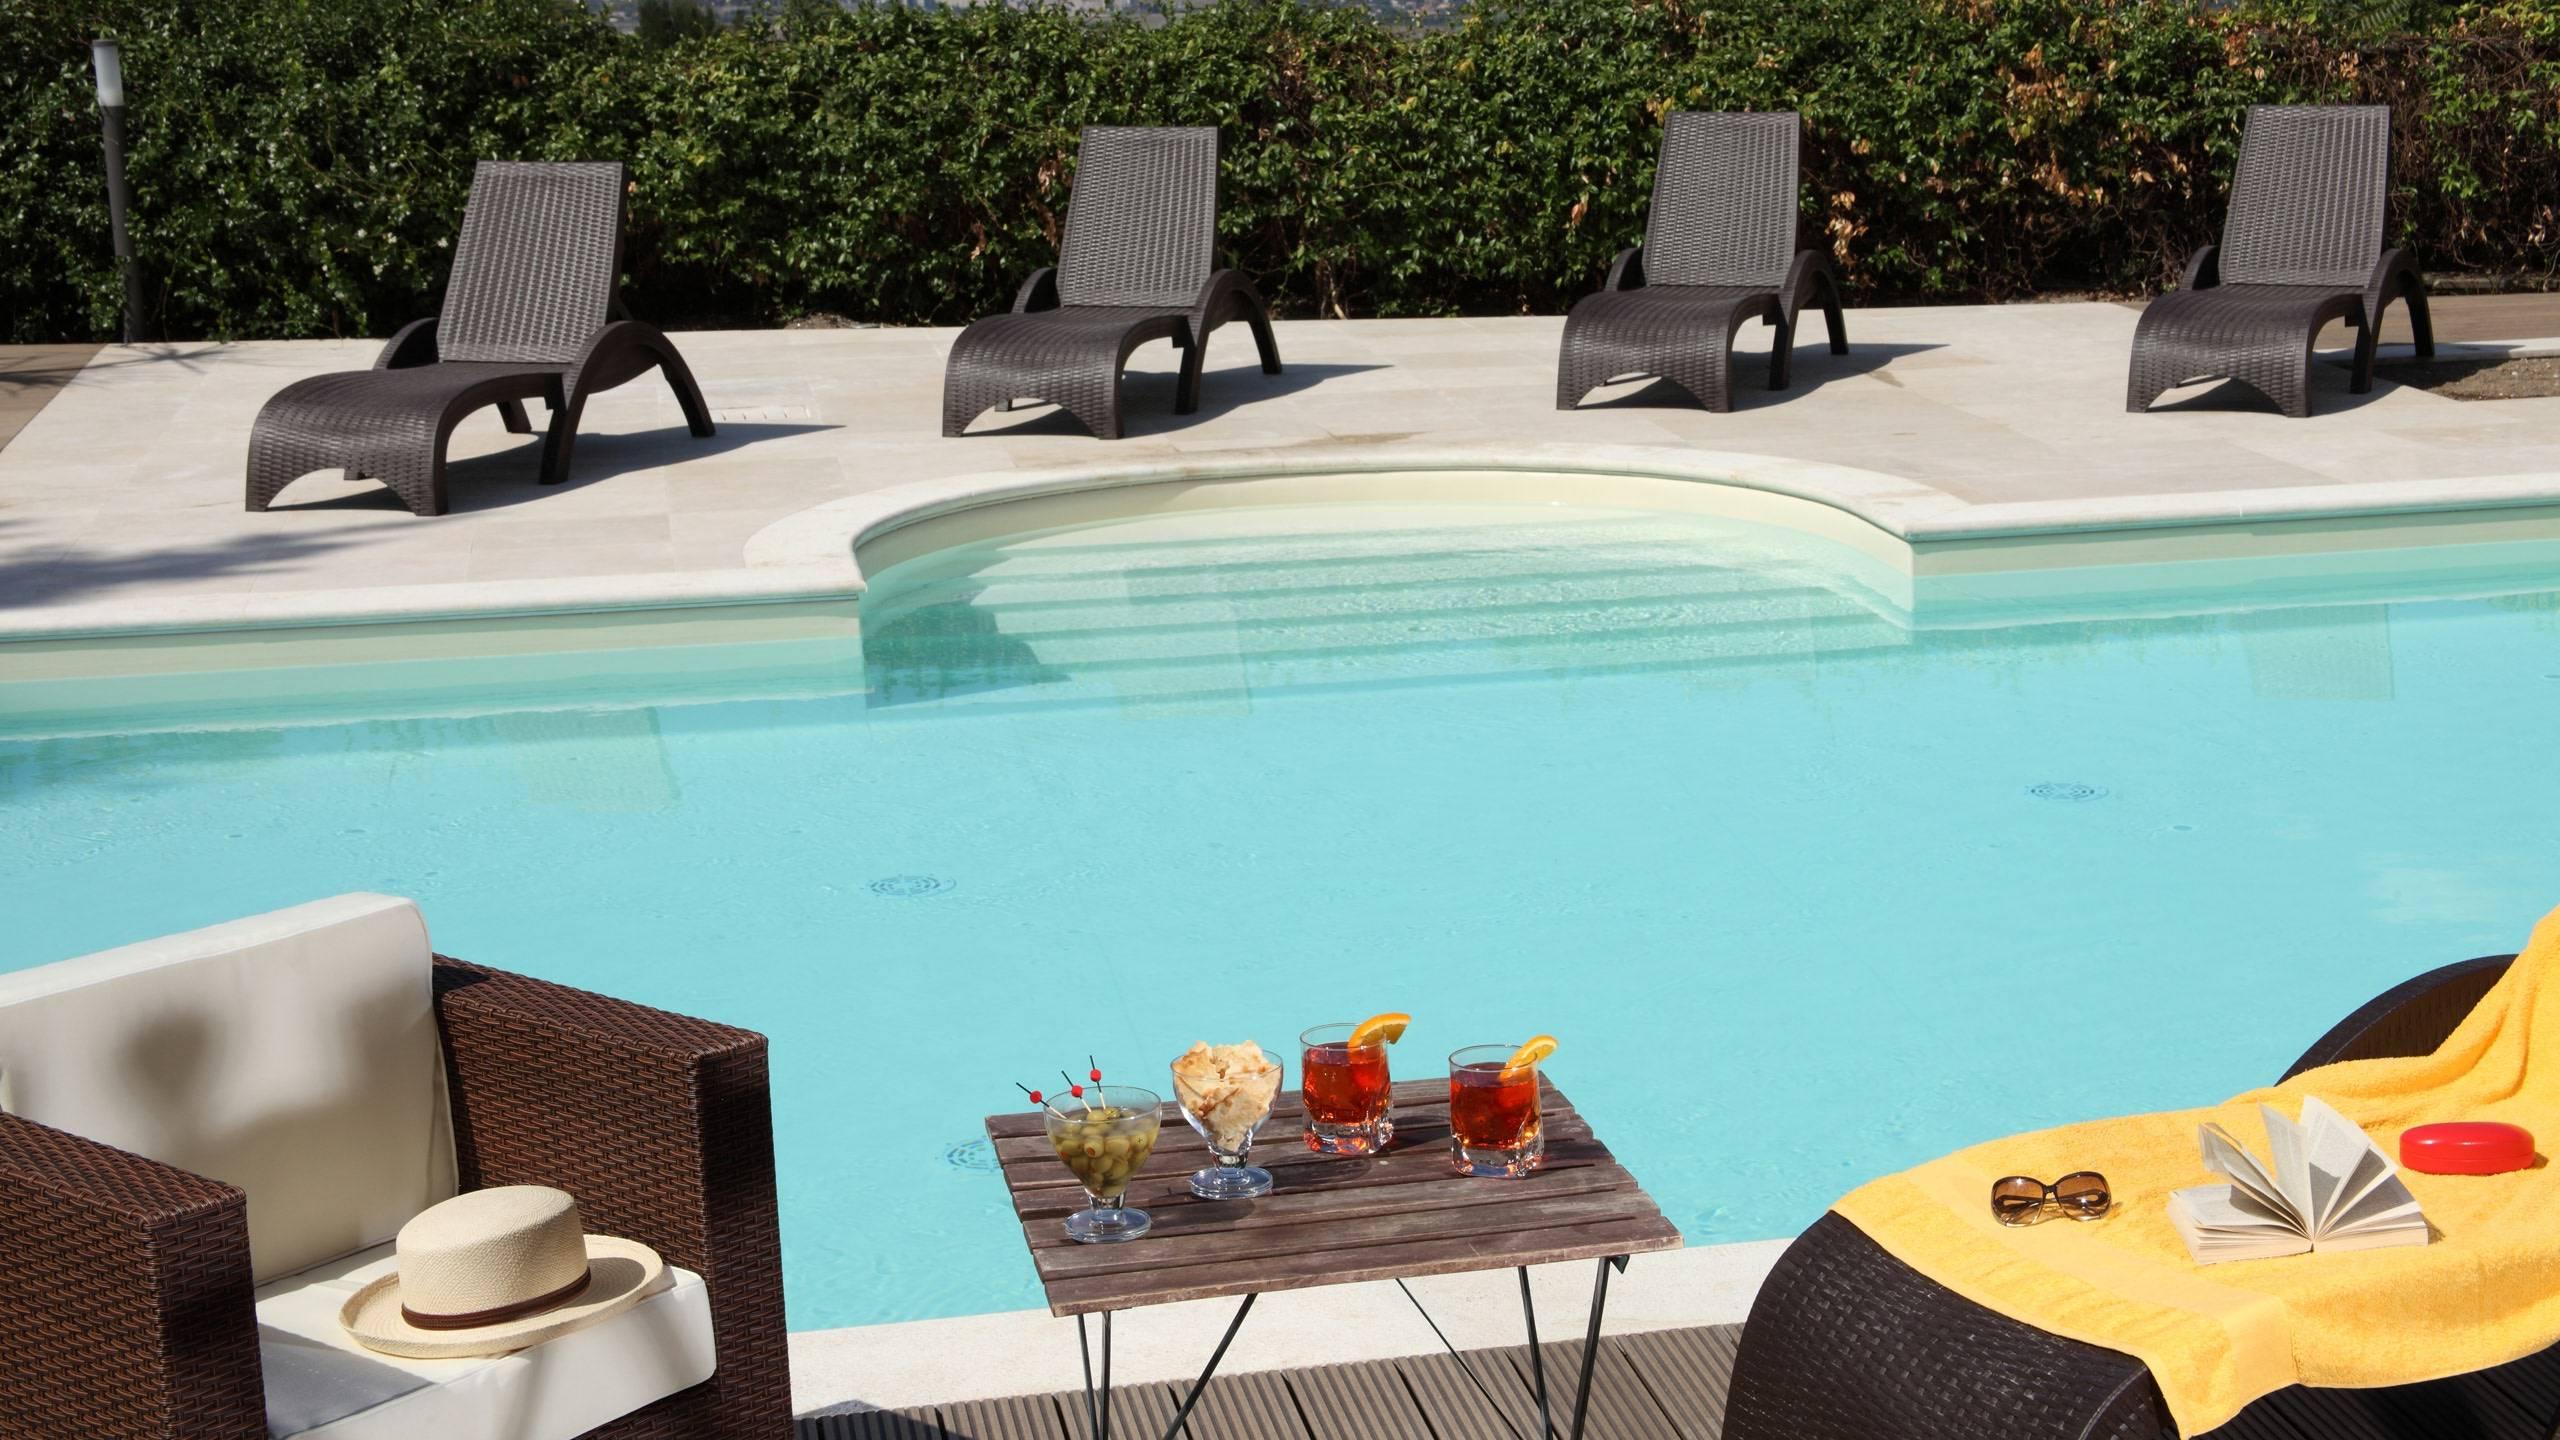 villamercede-piscina-24